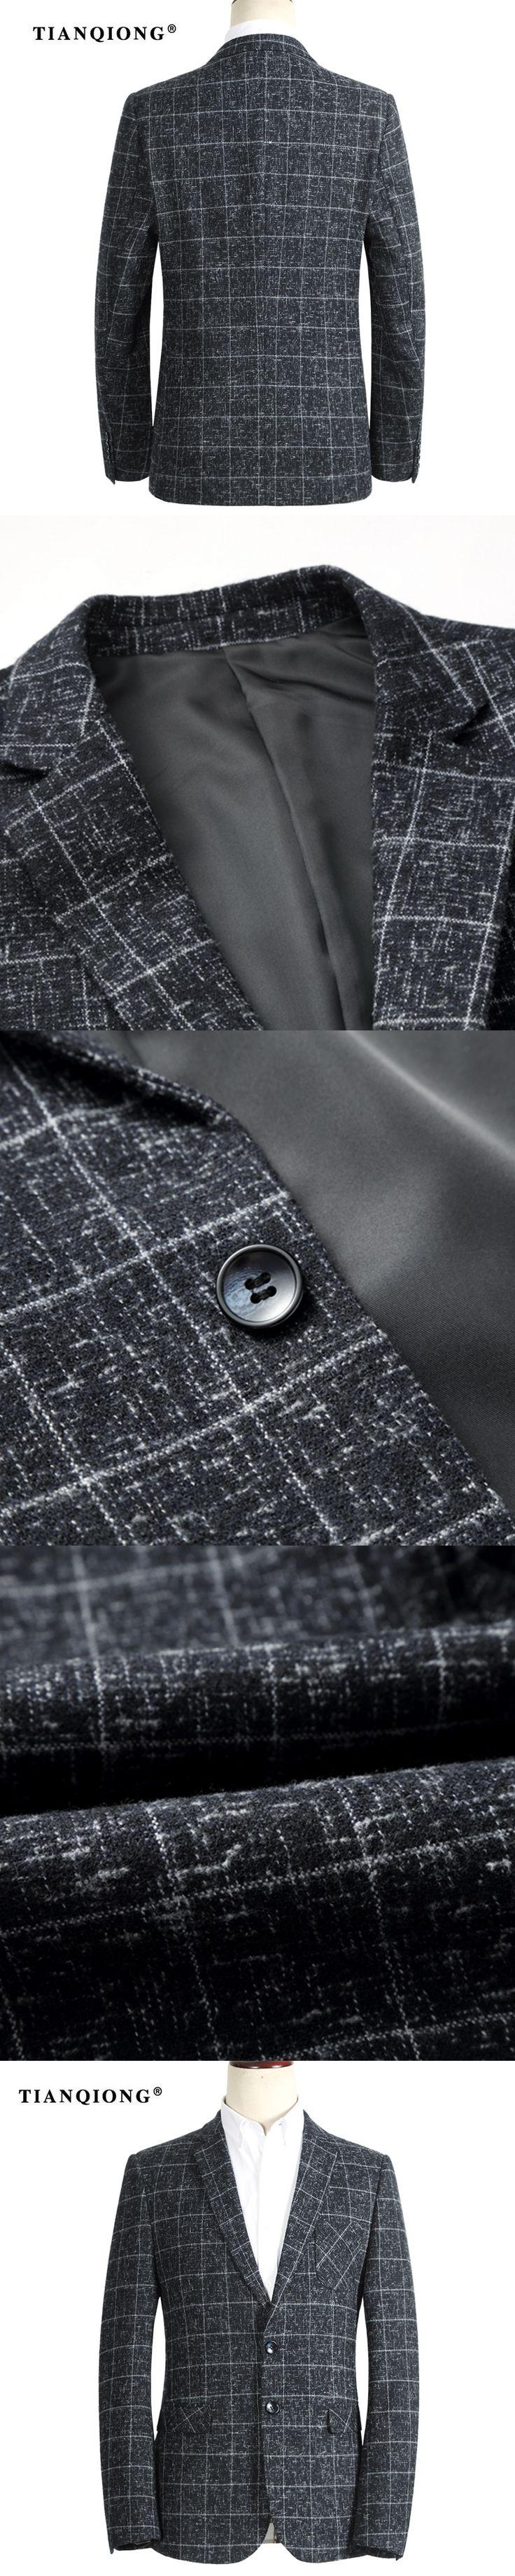 TIAN QIONG Winter Autumn Blazer Men 2017 Slim Fit Mens Plaid Blazer Fashion Blazers Luxury Gray Casual Business Suit Jacket